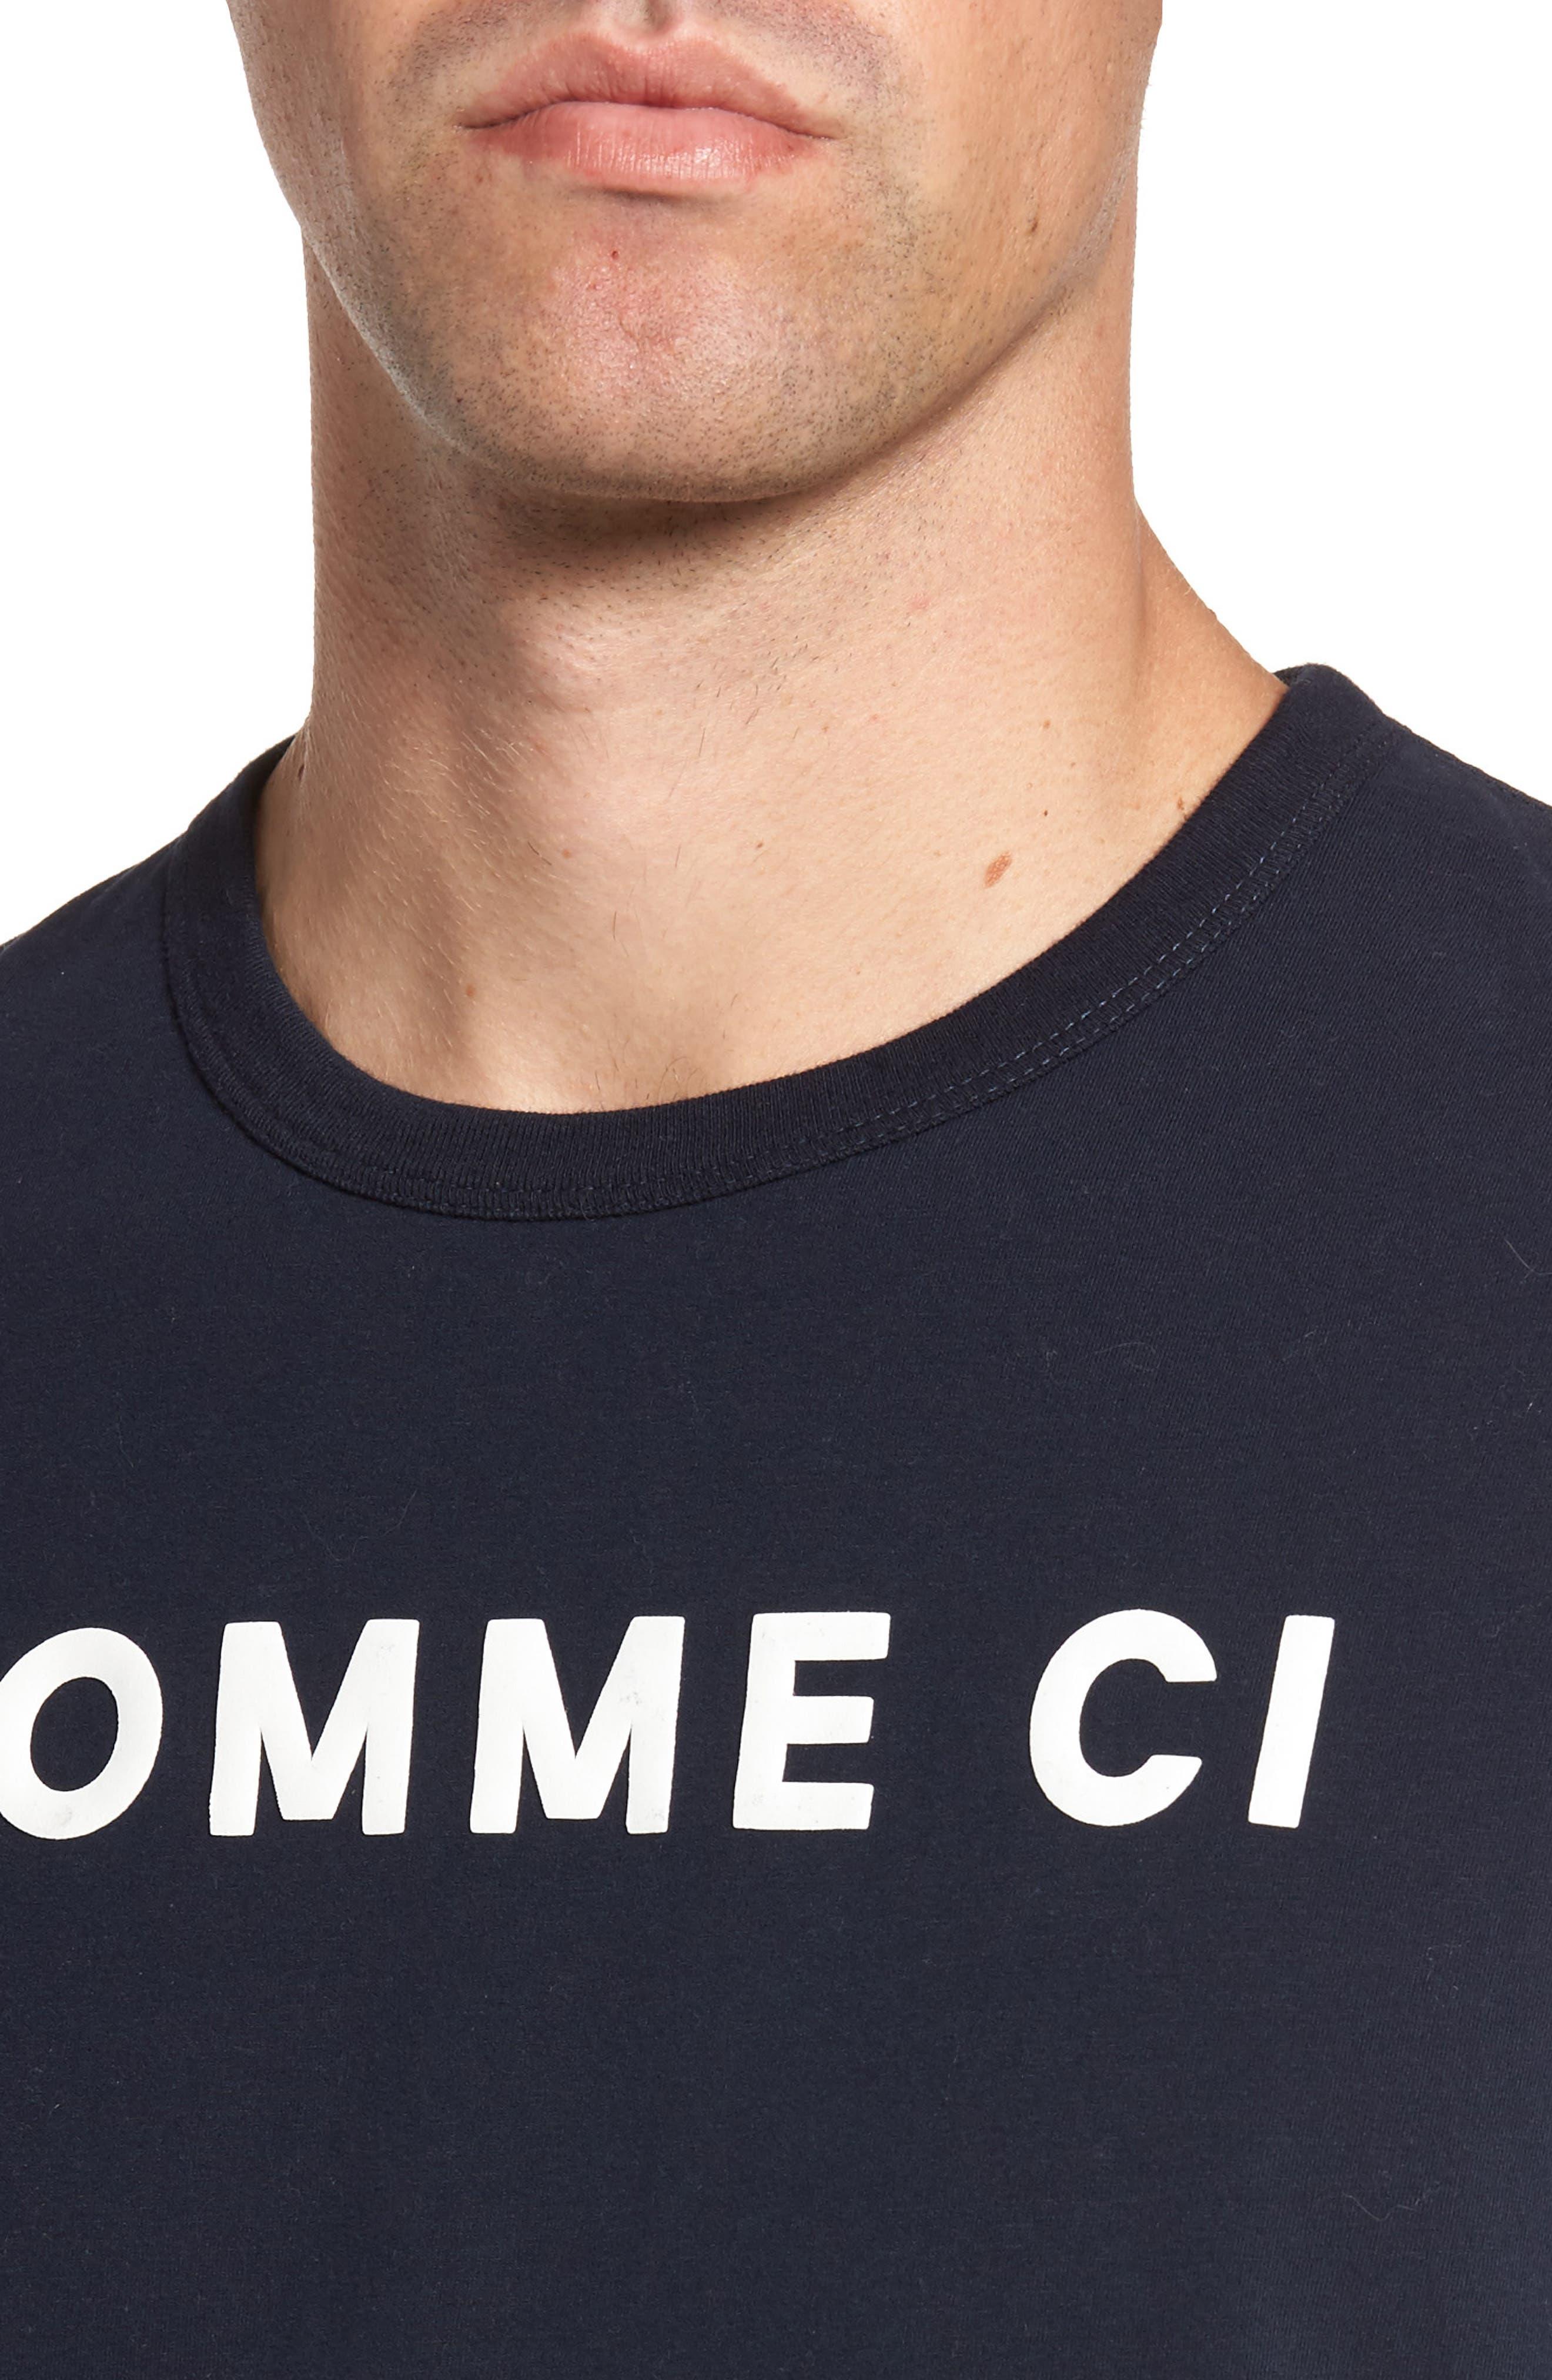 Comme Ci Comme Ça Regular Fit T-Shirt,                             Alternate thumbnail 4, color,                             Marine Blue/ White